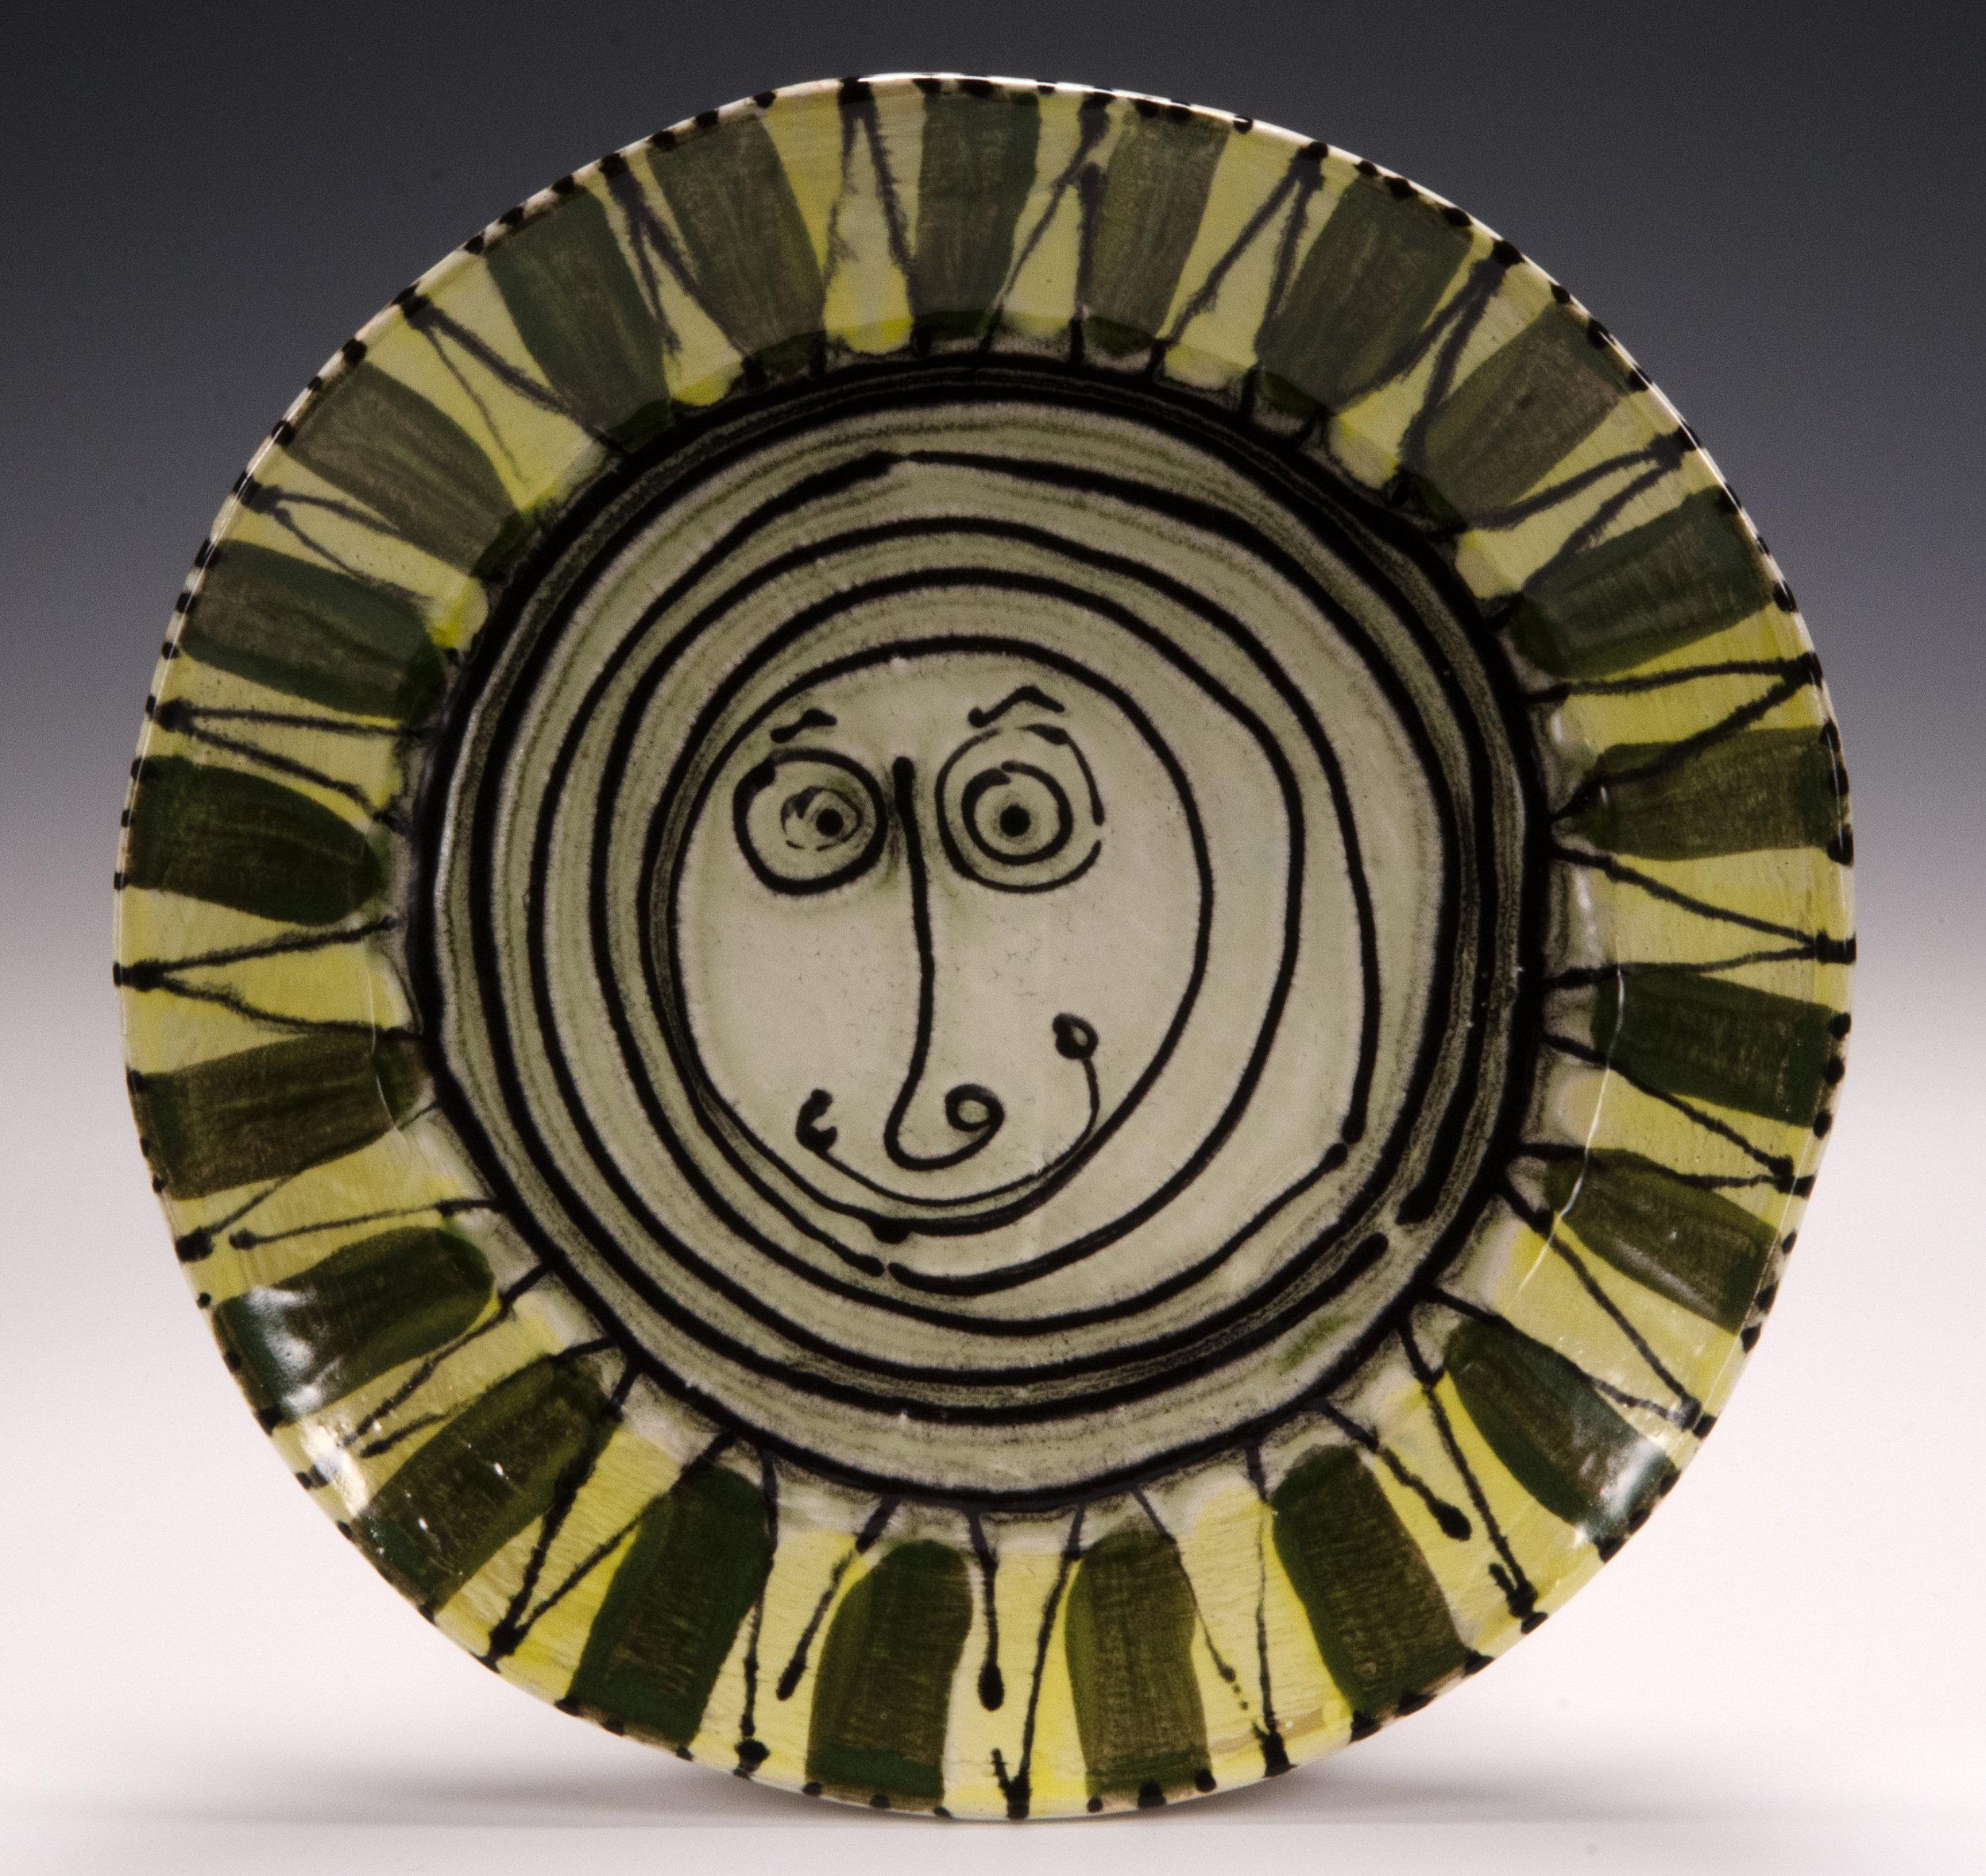 Dinner plate, 2016, slab made, stoneware, slip, stain, glaze, 10.5 inches